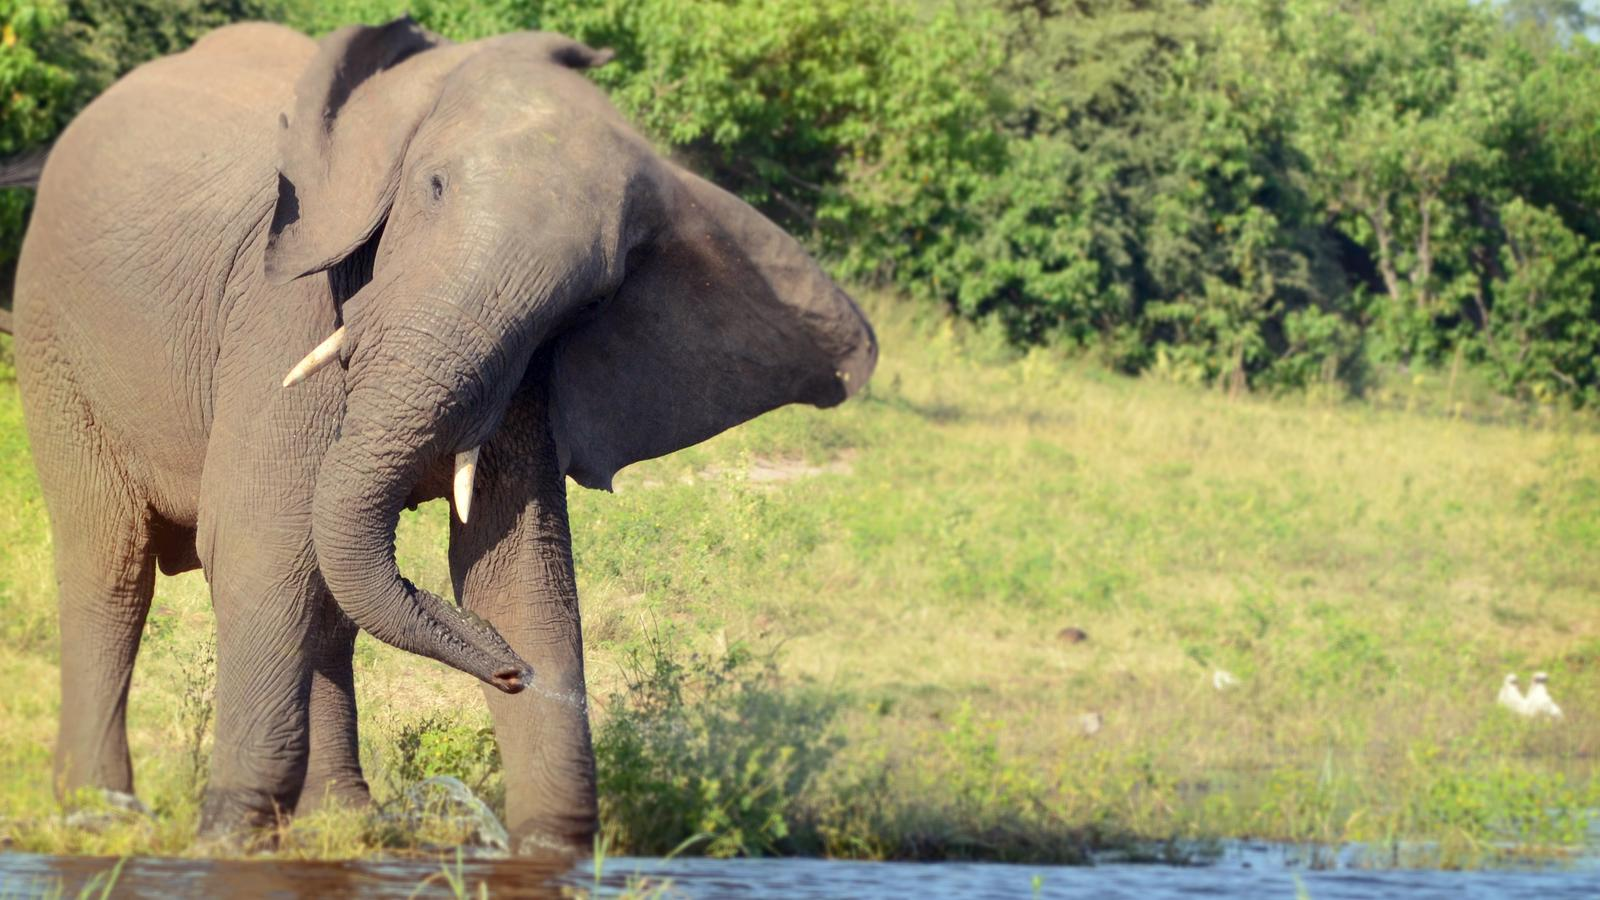 traveljunkies Afrika Südafrika Botswana Simbabwe Reisen für junge Leute Safari Elefant Krüger Nationalpark Okavango Delta Victoriafälle